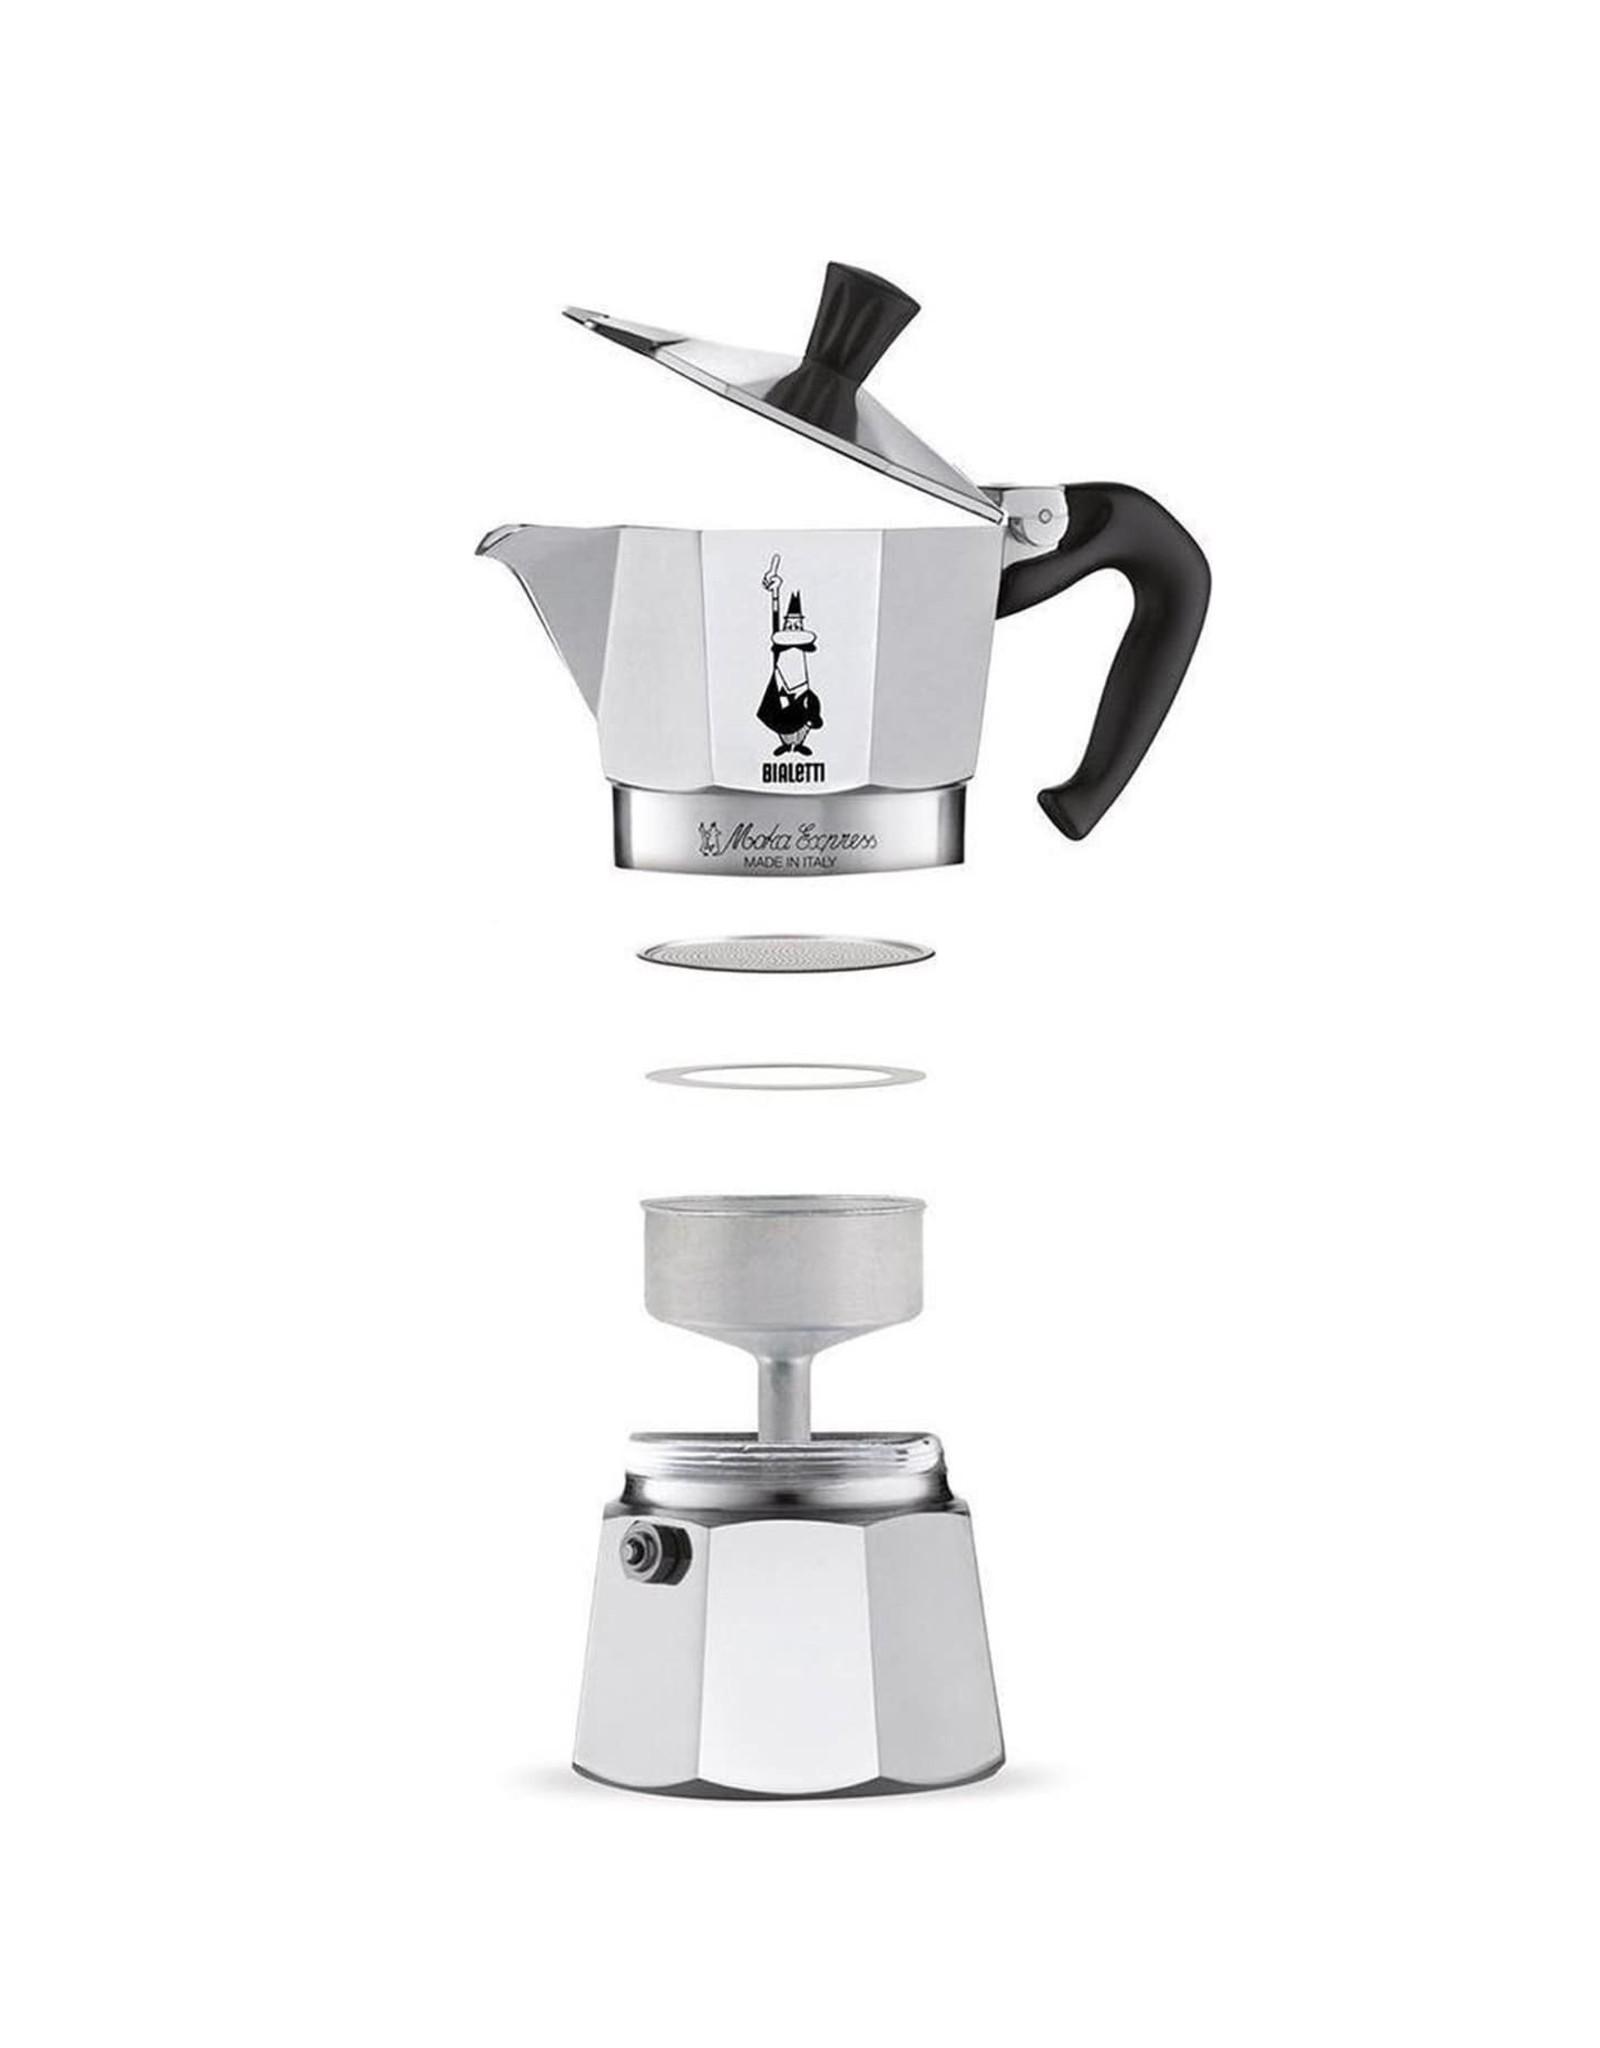 Bialetti Bialetti Aluminium 1 cup